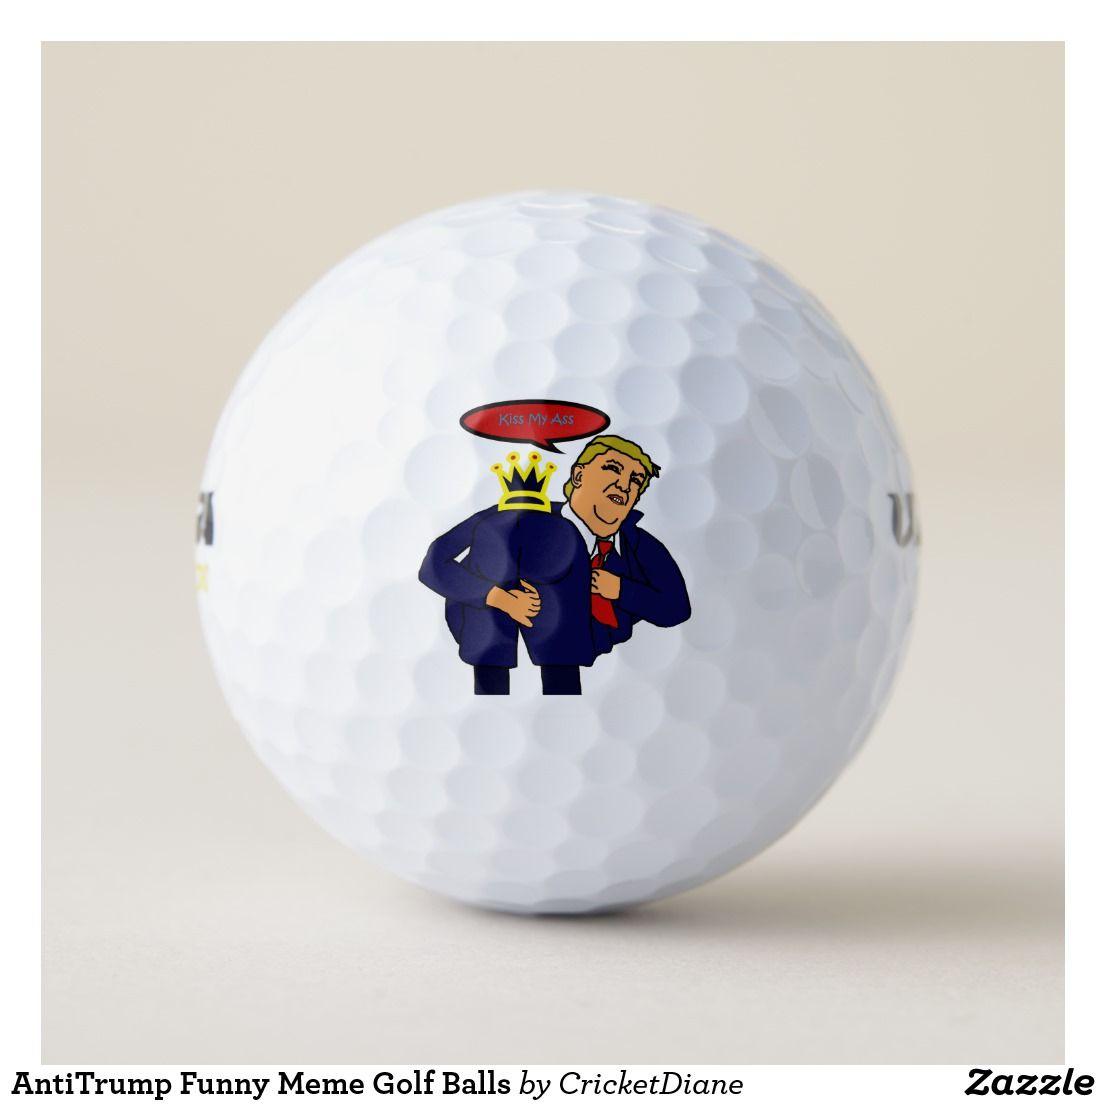 Antitrump Funny Meme Golf Balls Funny Funnymemes Meme Trump Antitrump Golf Golfaccessories Politics Golf Ball Golf Golf Humor